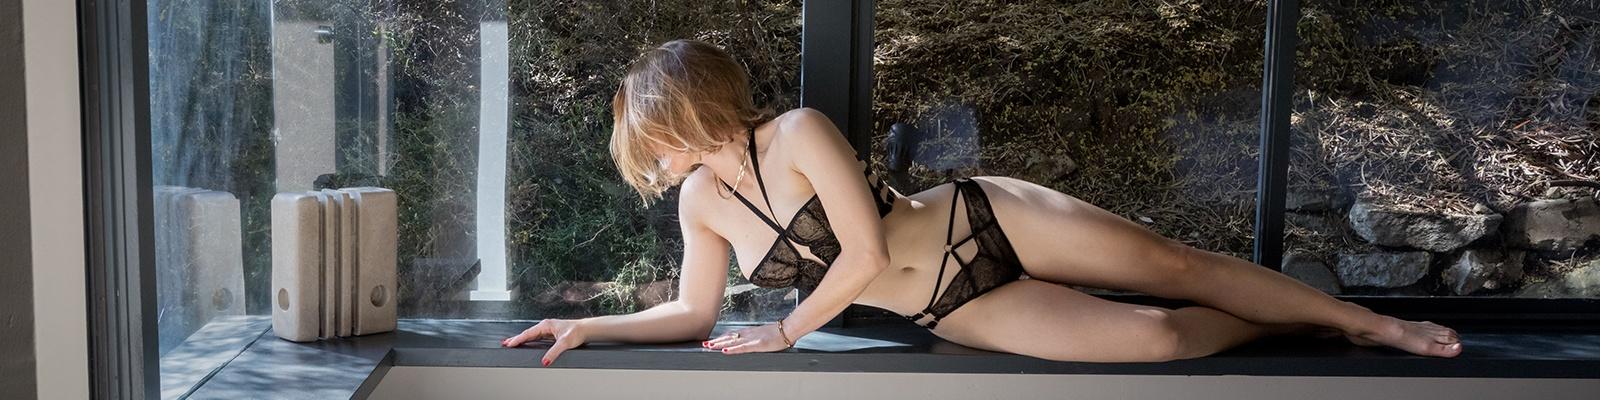 Chloé Lea Escort